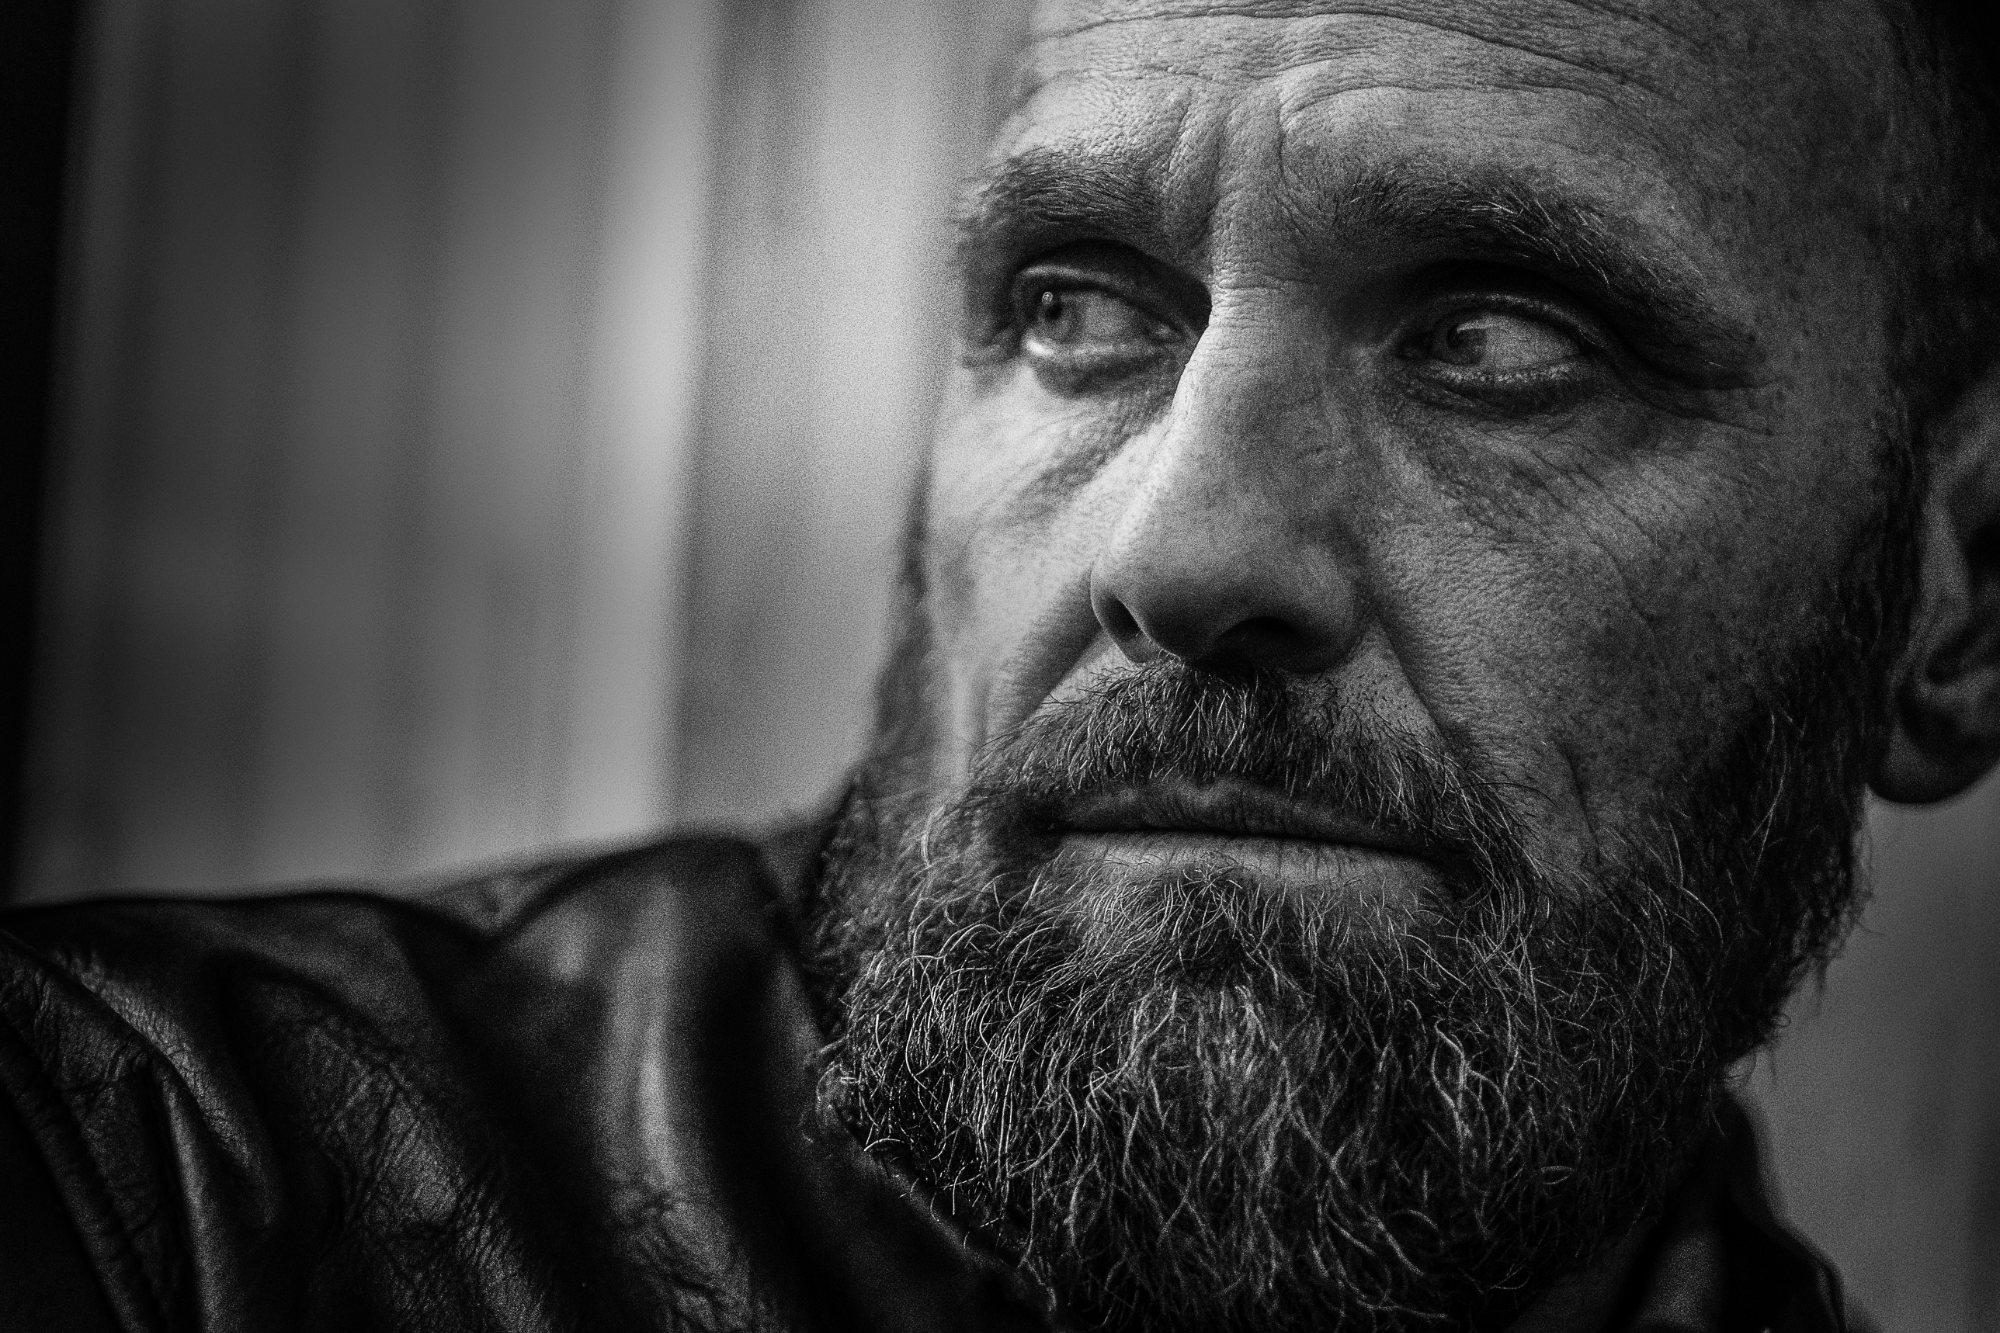 Chris Clor - portrait of guy with beard